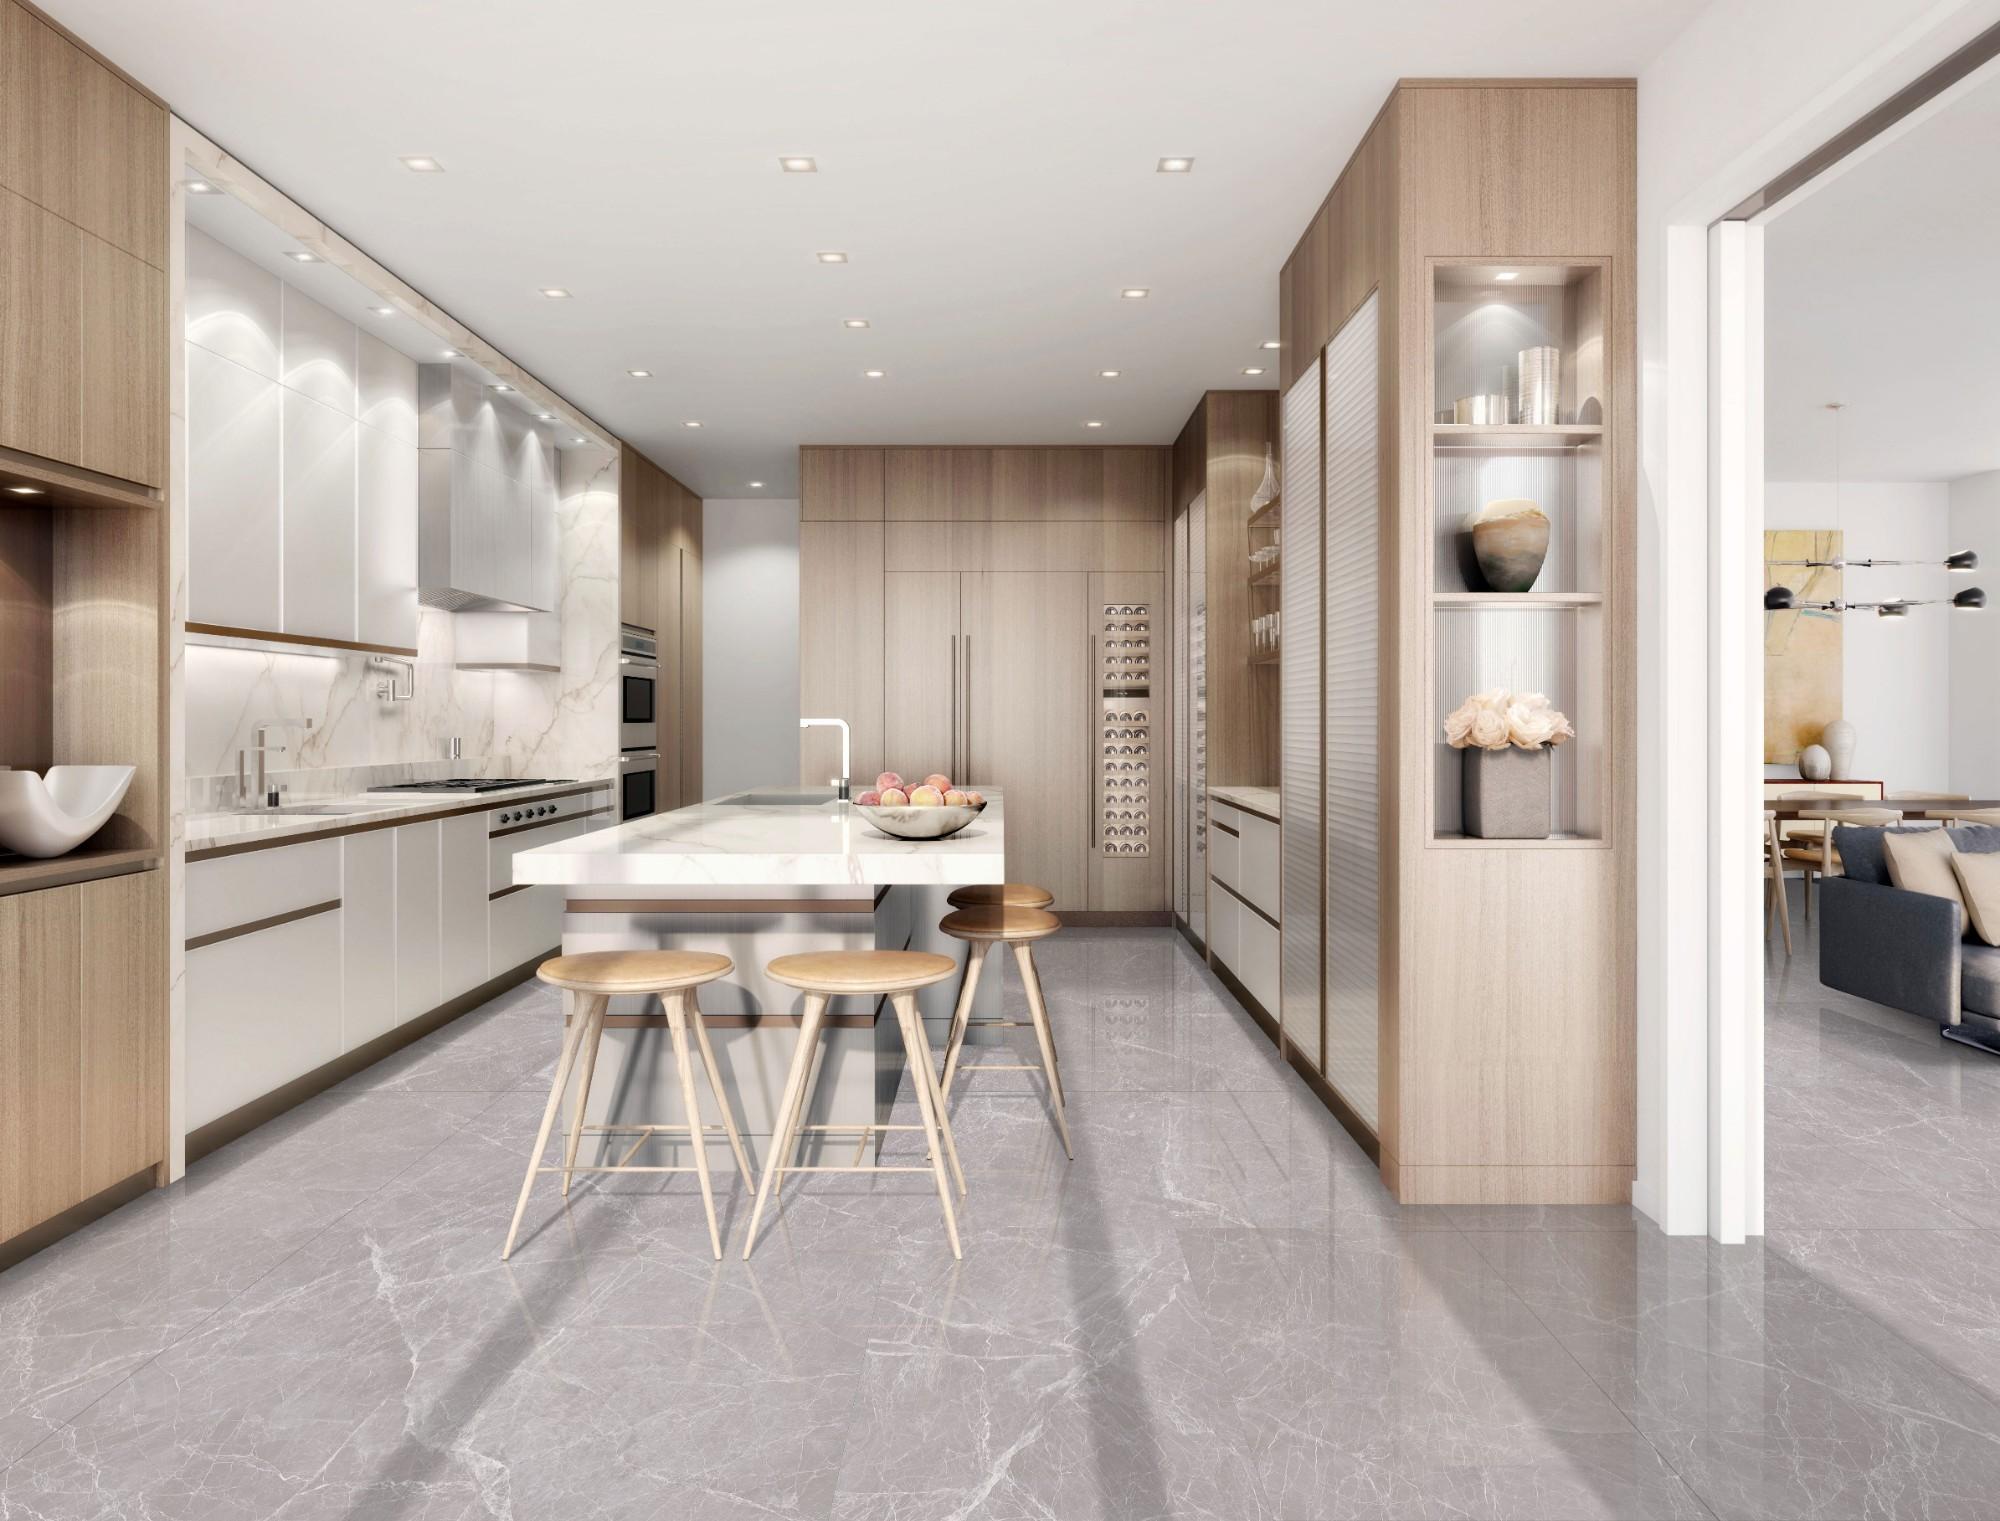 Claros Grey(light) Grey Marble Tiles Manufacturers, Claros Grey(light) Grey Marble Tiles Factory, Supply Claros Grey(light) Grey Marble Tiles